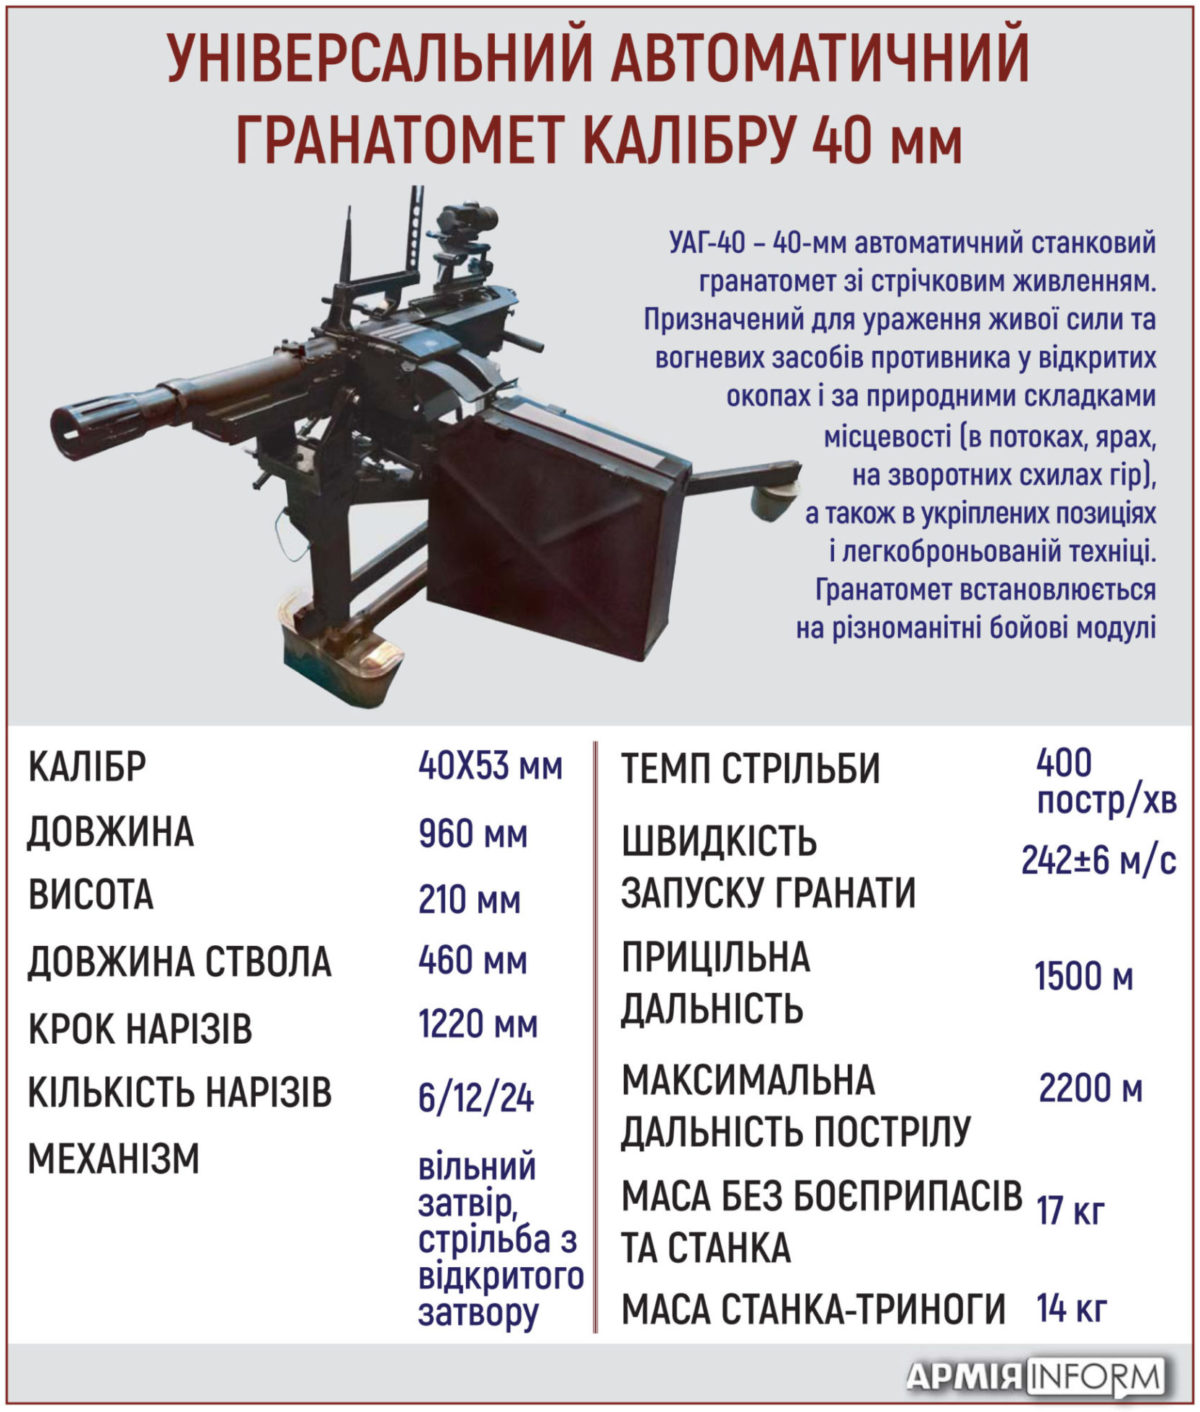 uag-40.jpg